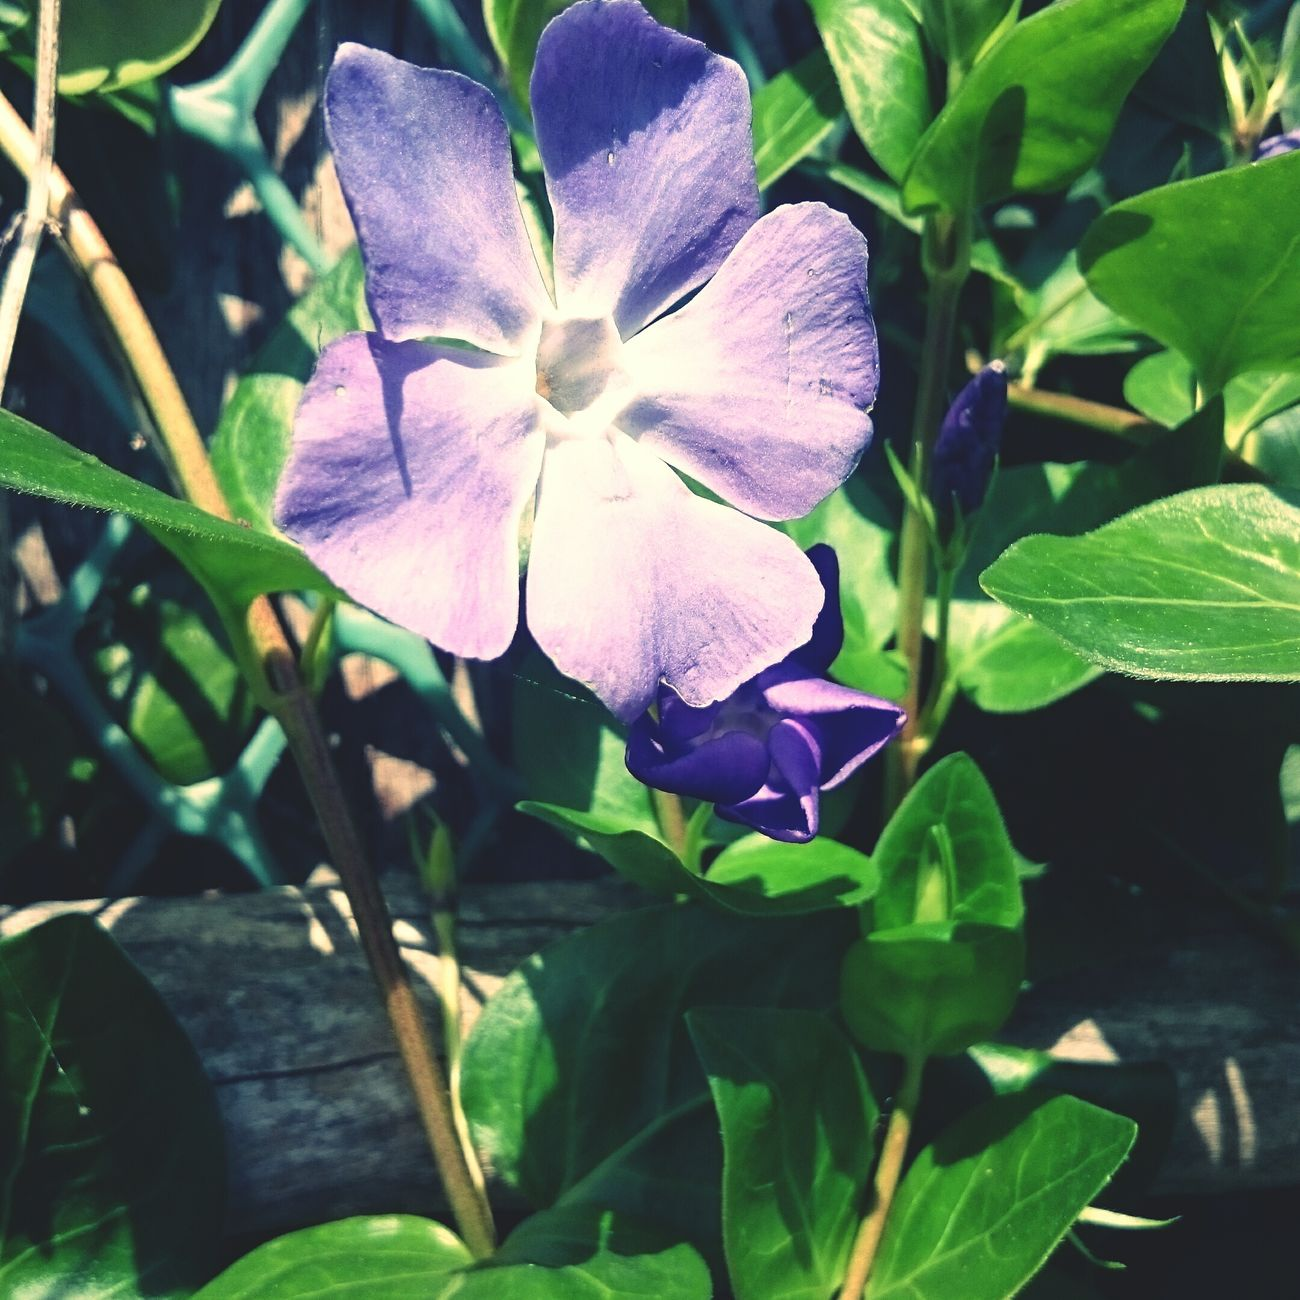 Tunisia Flowers Bni_Mtir Summer ☀